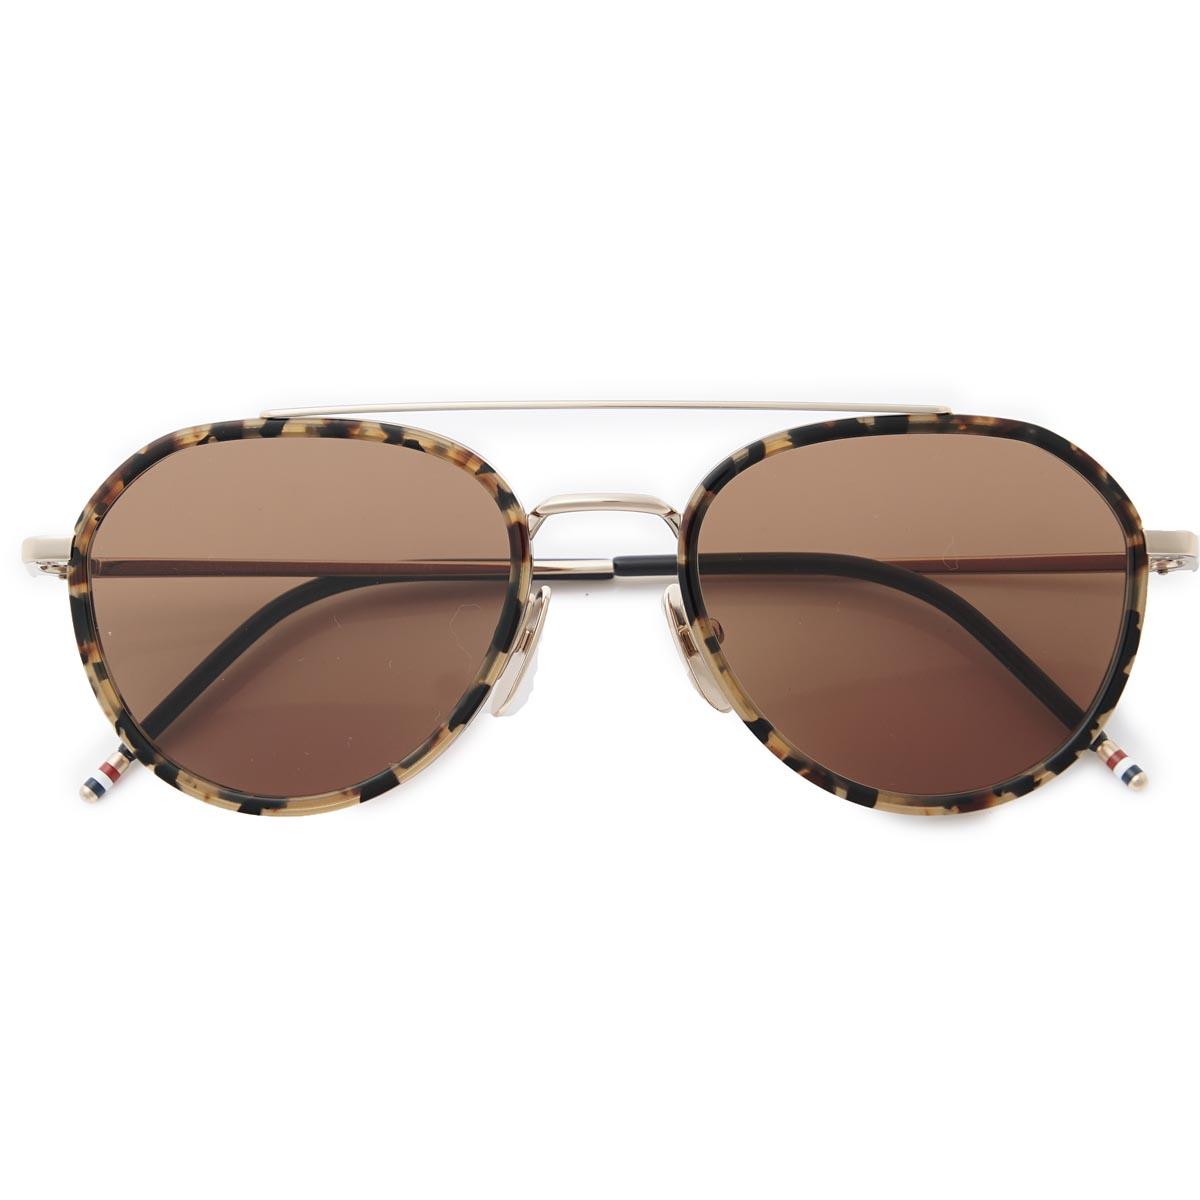 6c7a7fecfd96 Modern Blue Rakuten Ichiba Shop  Tom Browne THOM BROWNE. Sunglasses ...